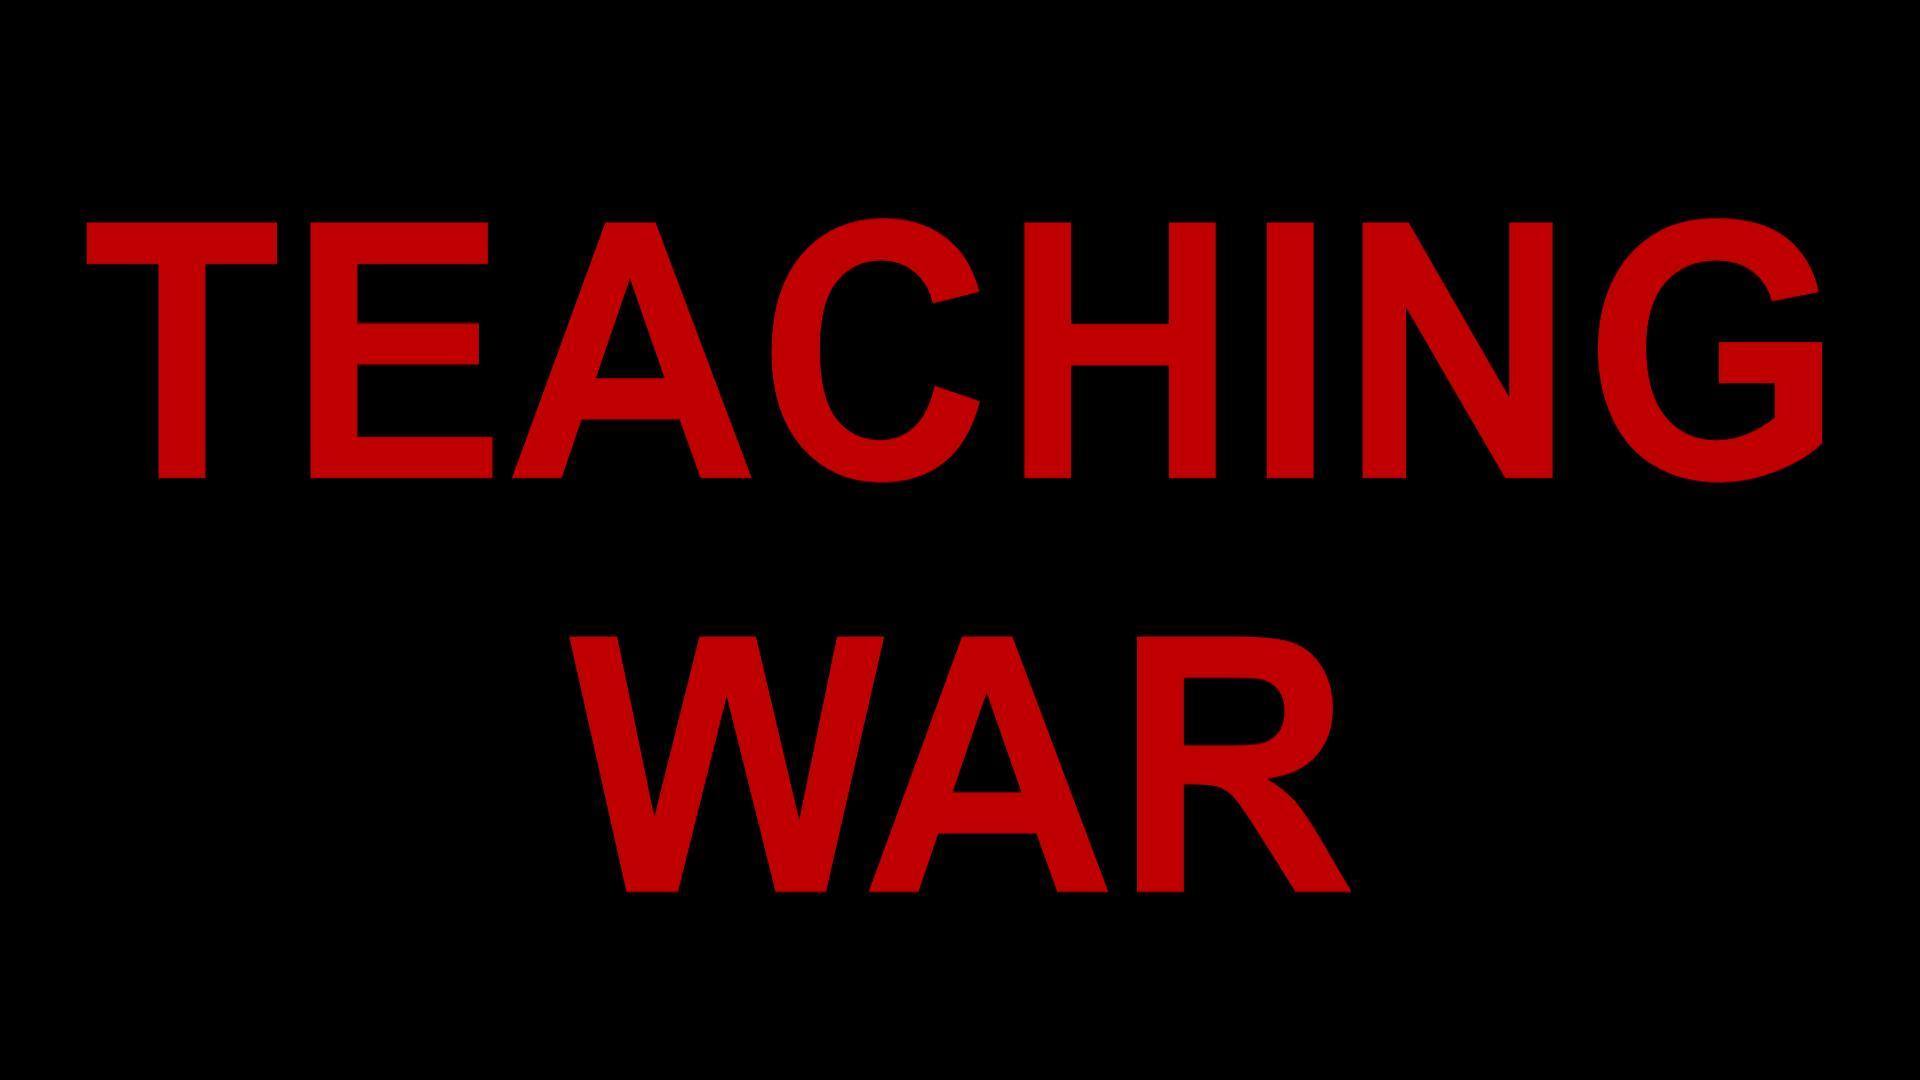 TEACHING WAR